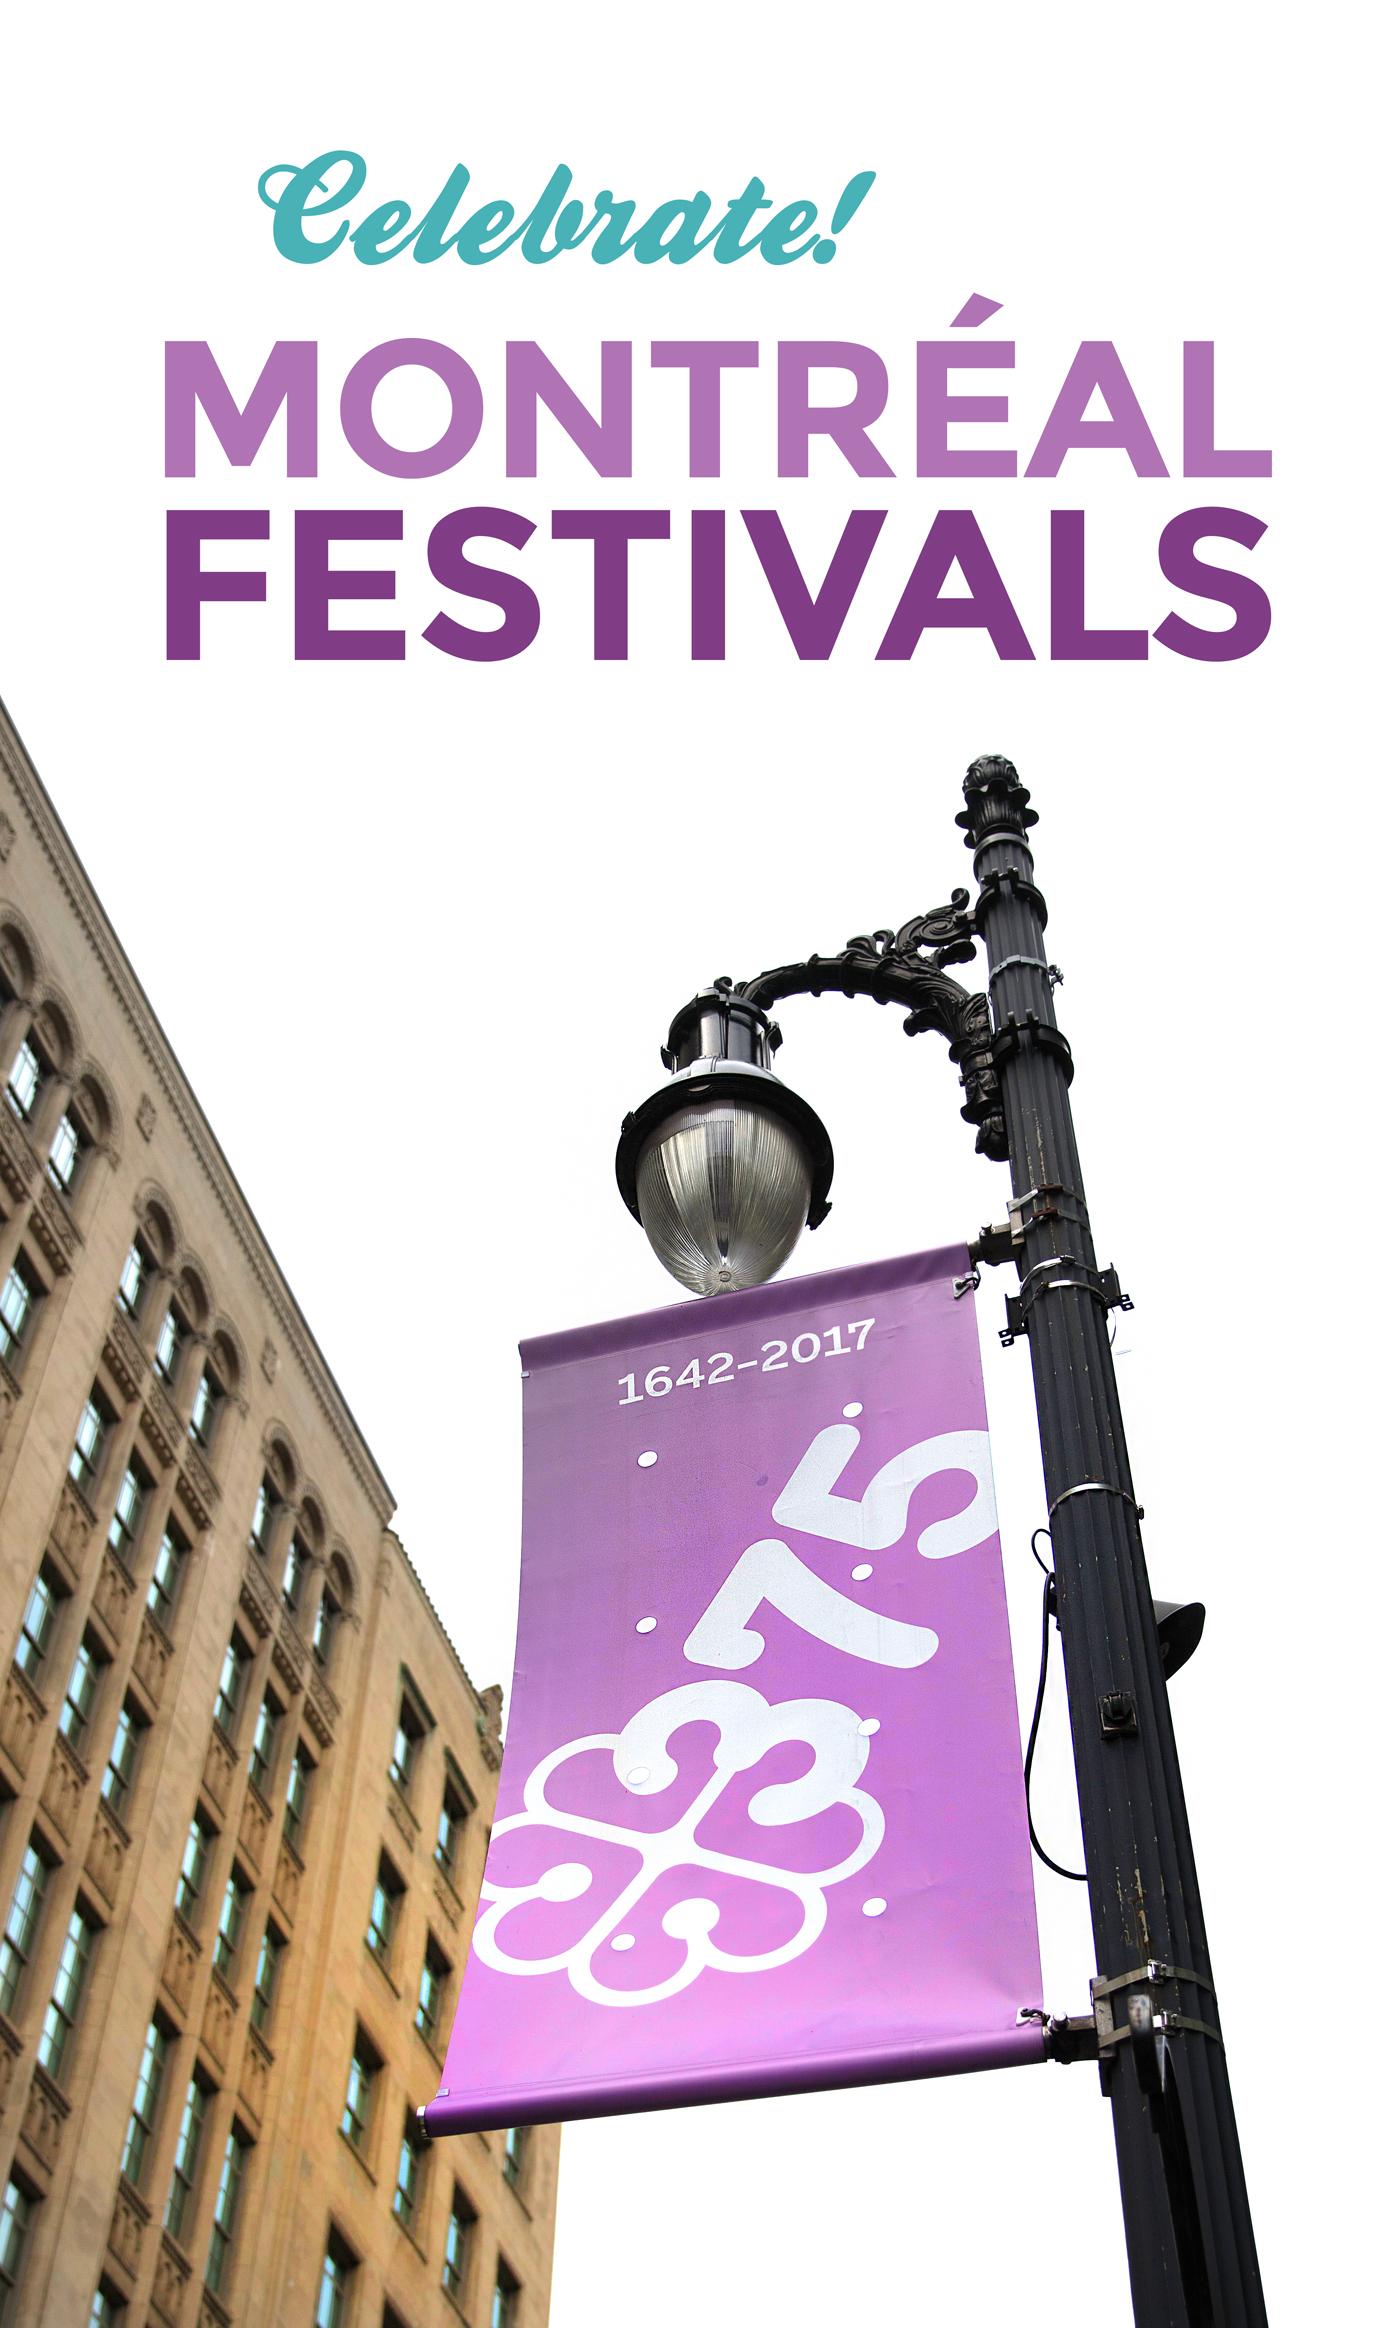 Travel Guide for Montréal Festivals in Québec, Canada